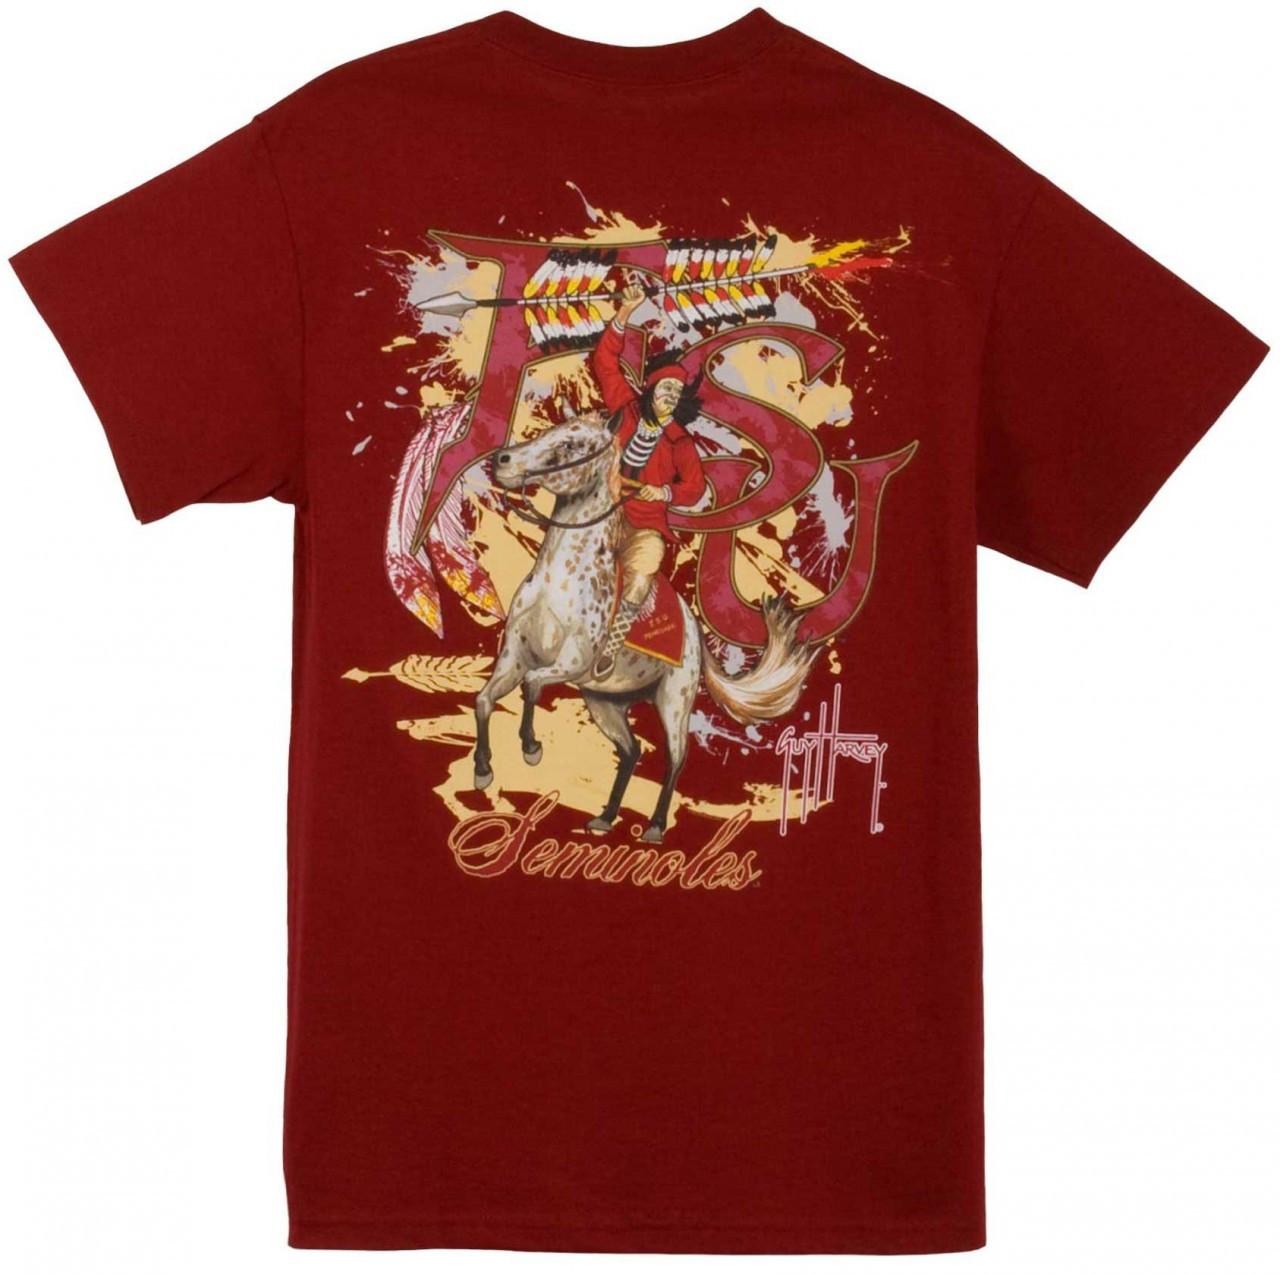 934b927afc3 Guy Harvey Florida State Seminoles Back-Print Pocketless Men's Tee in White  or Garnet